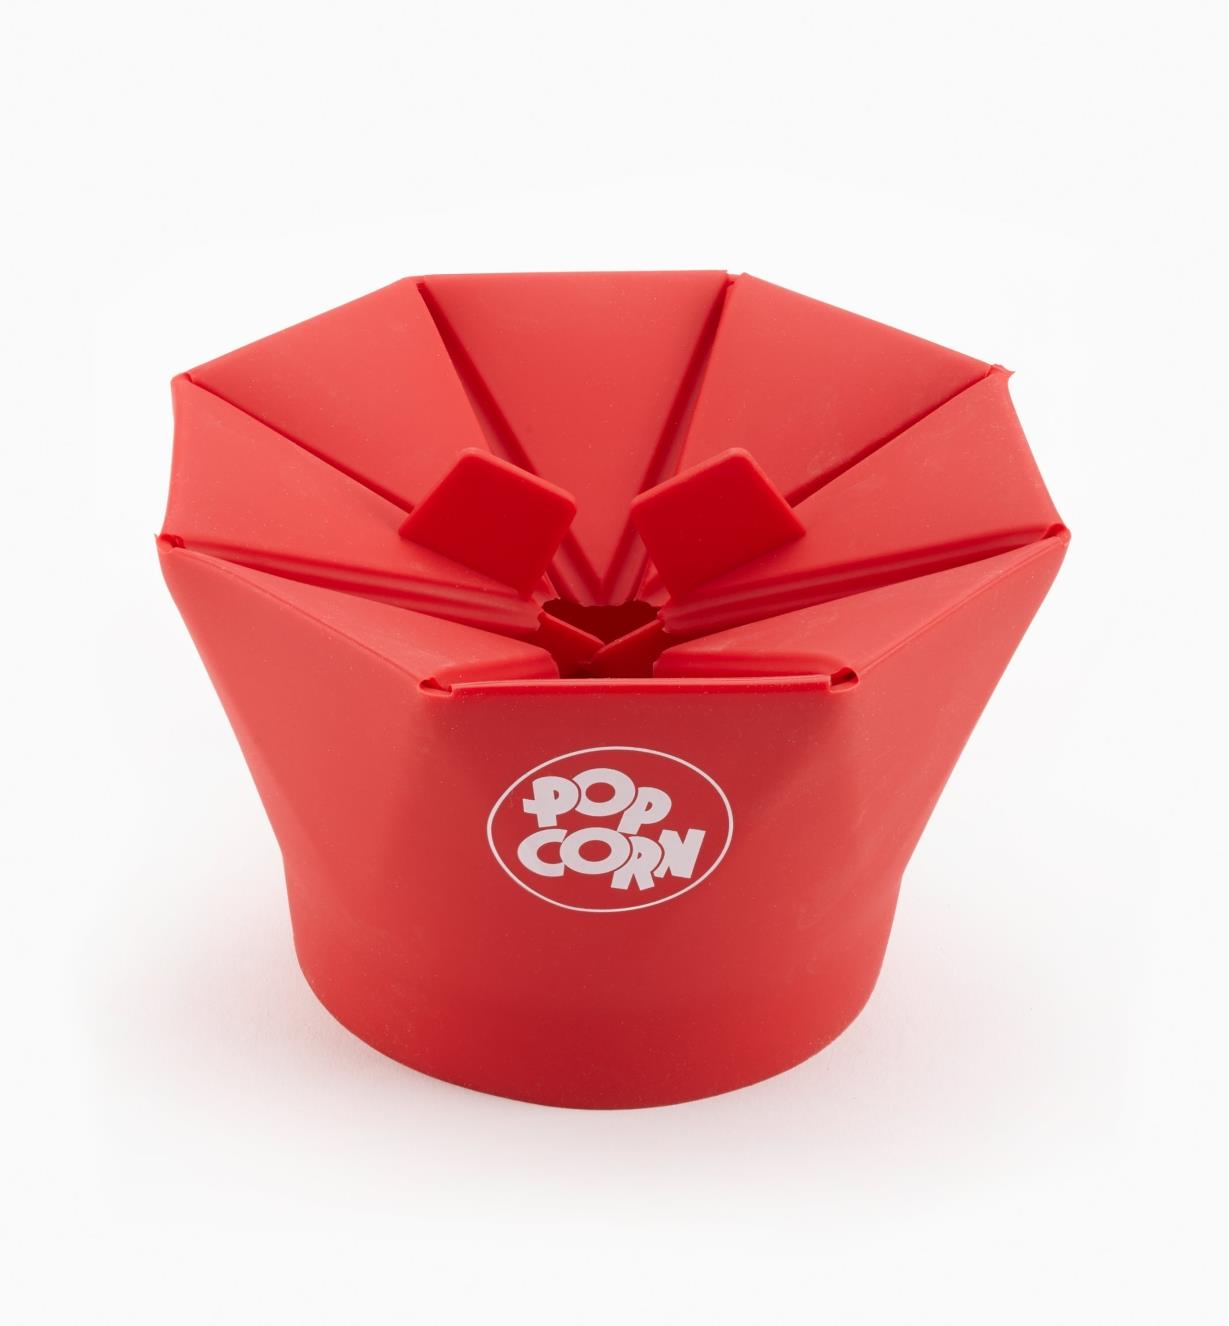 ET252 - Poptop Popcorn Popper